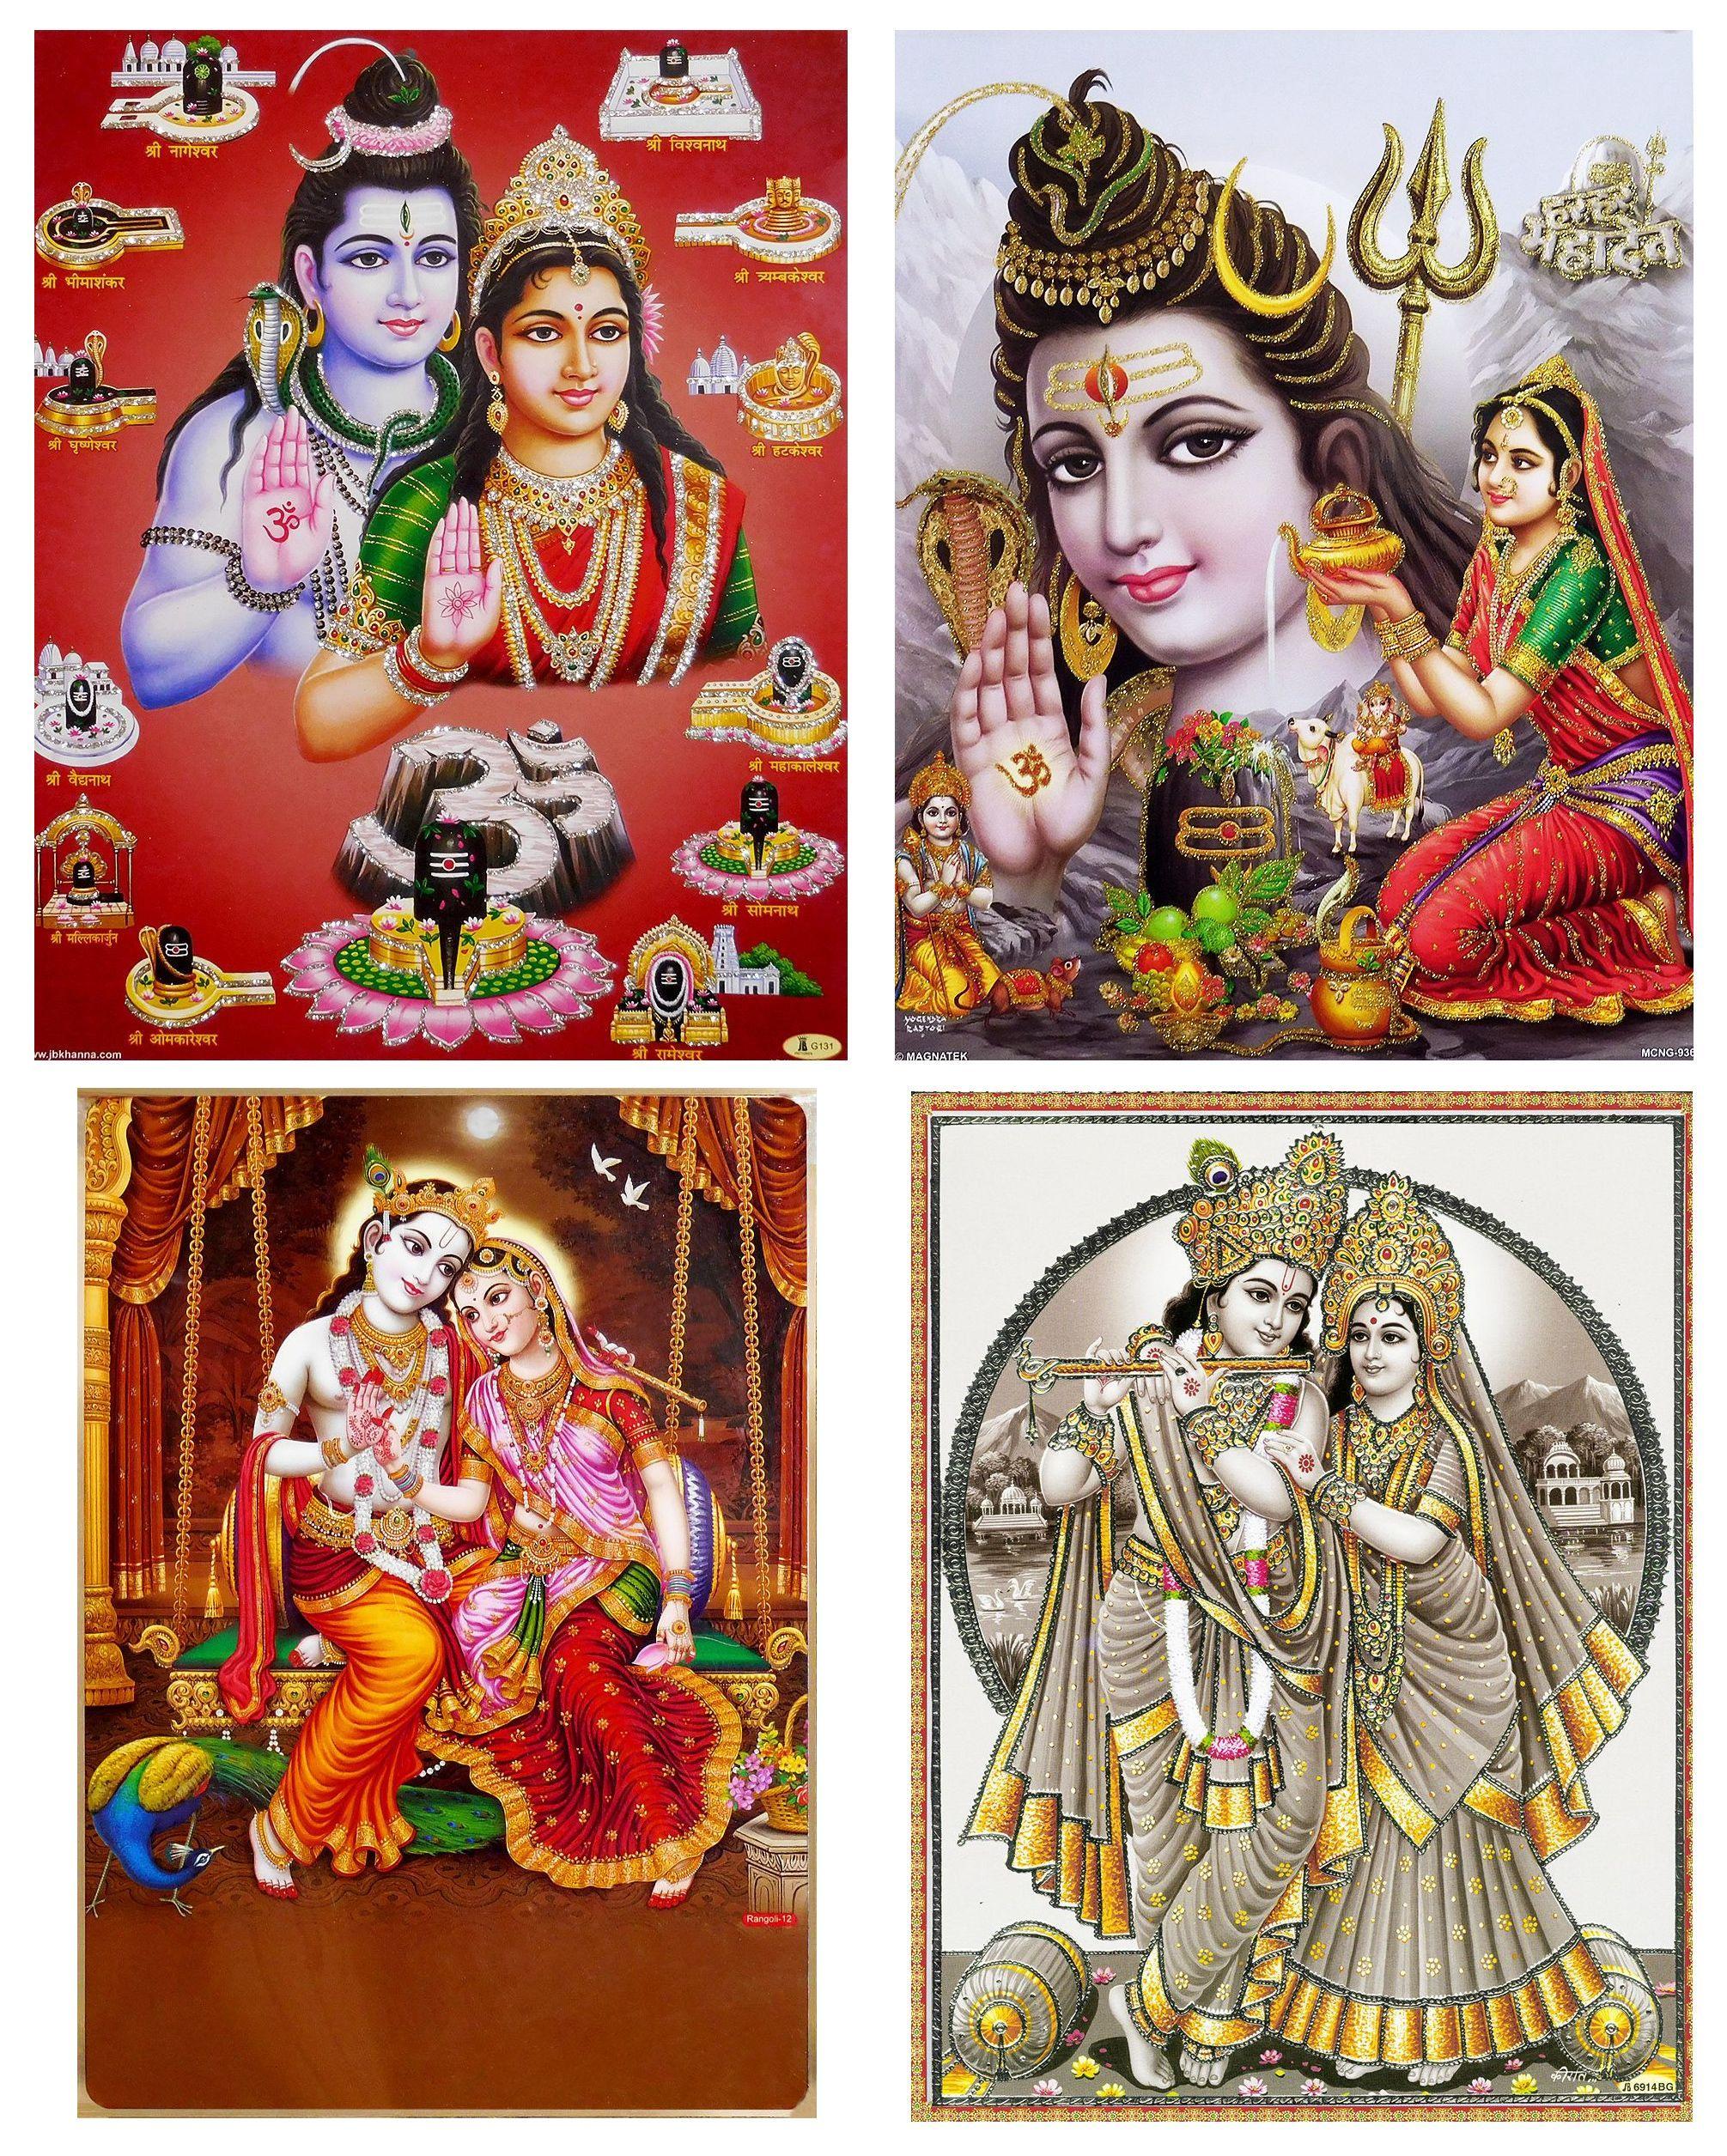 Shiva Parvati And Radha Krishna Set Of 4 Posters